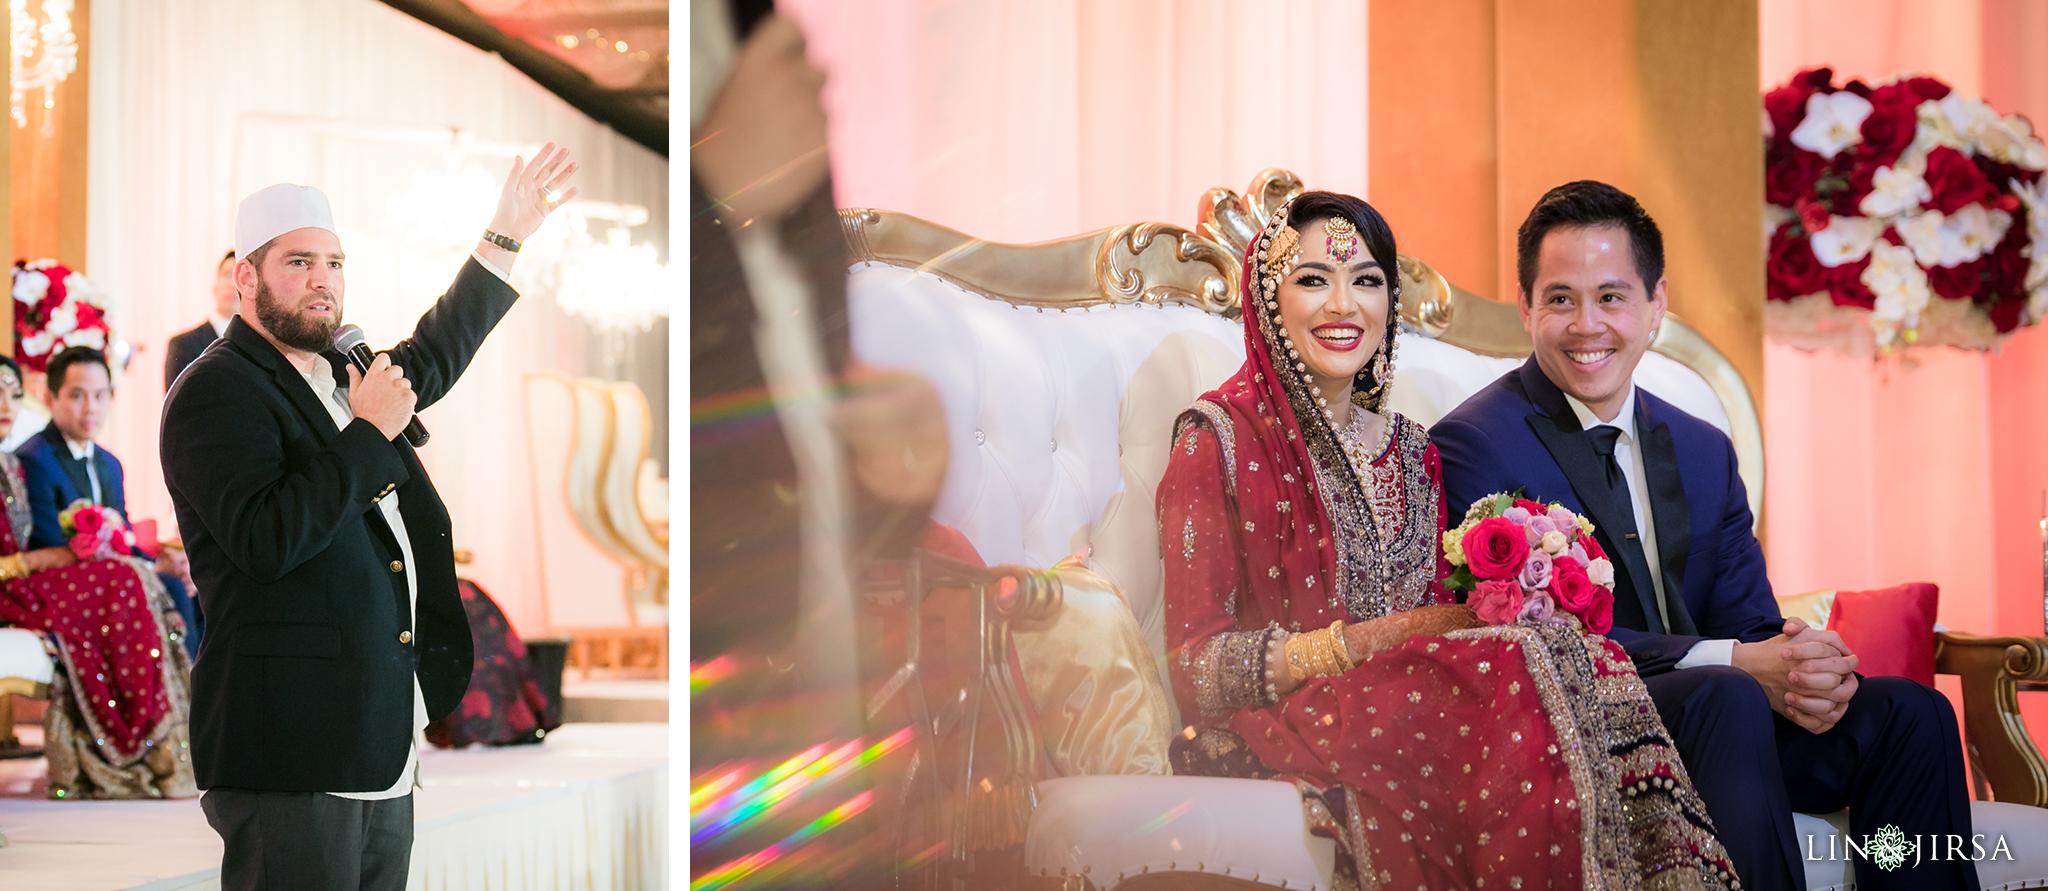 16-Hyatt-regency-long-beach-wedding-photography